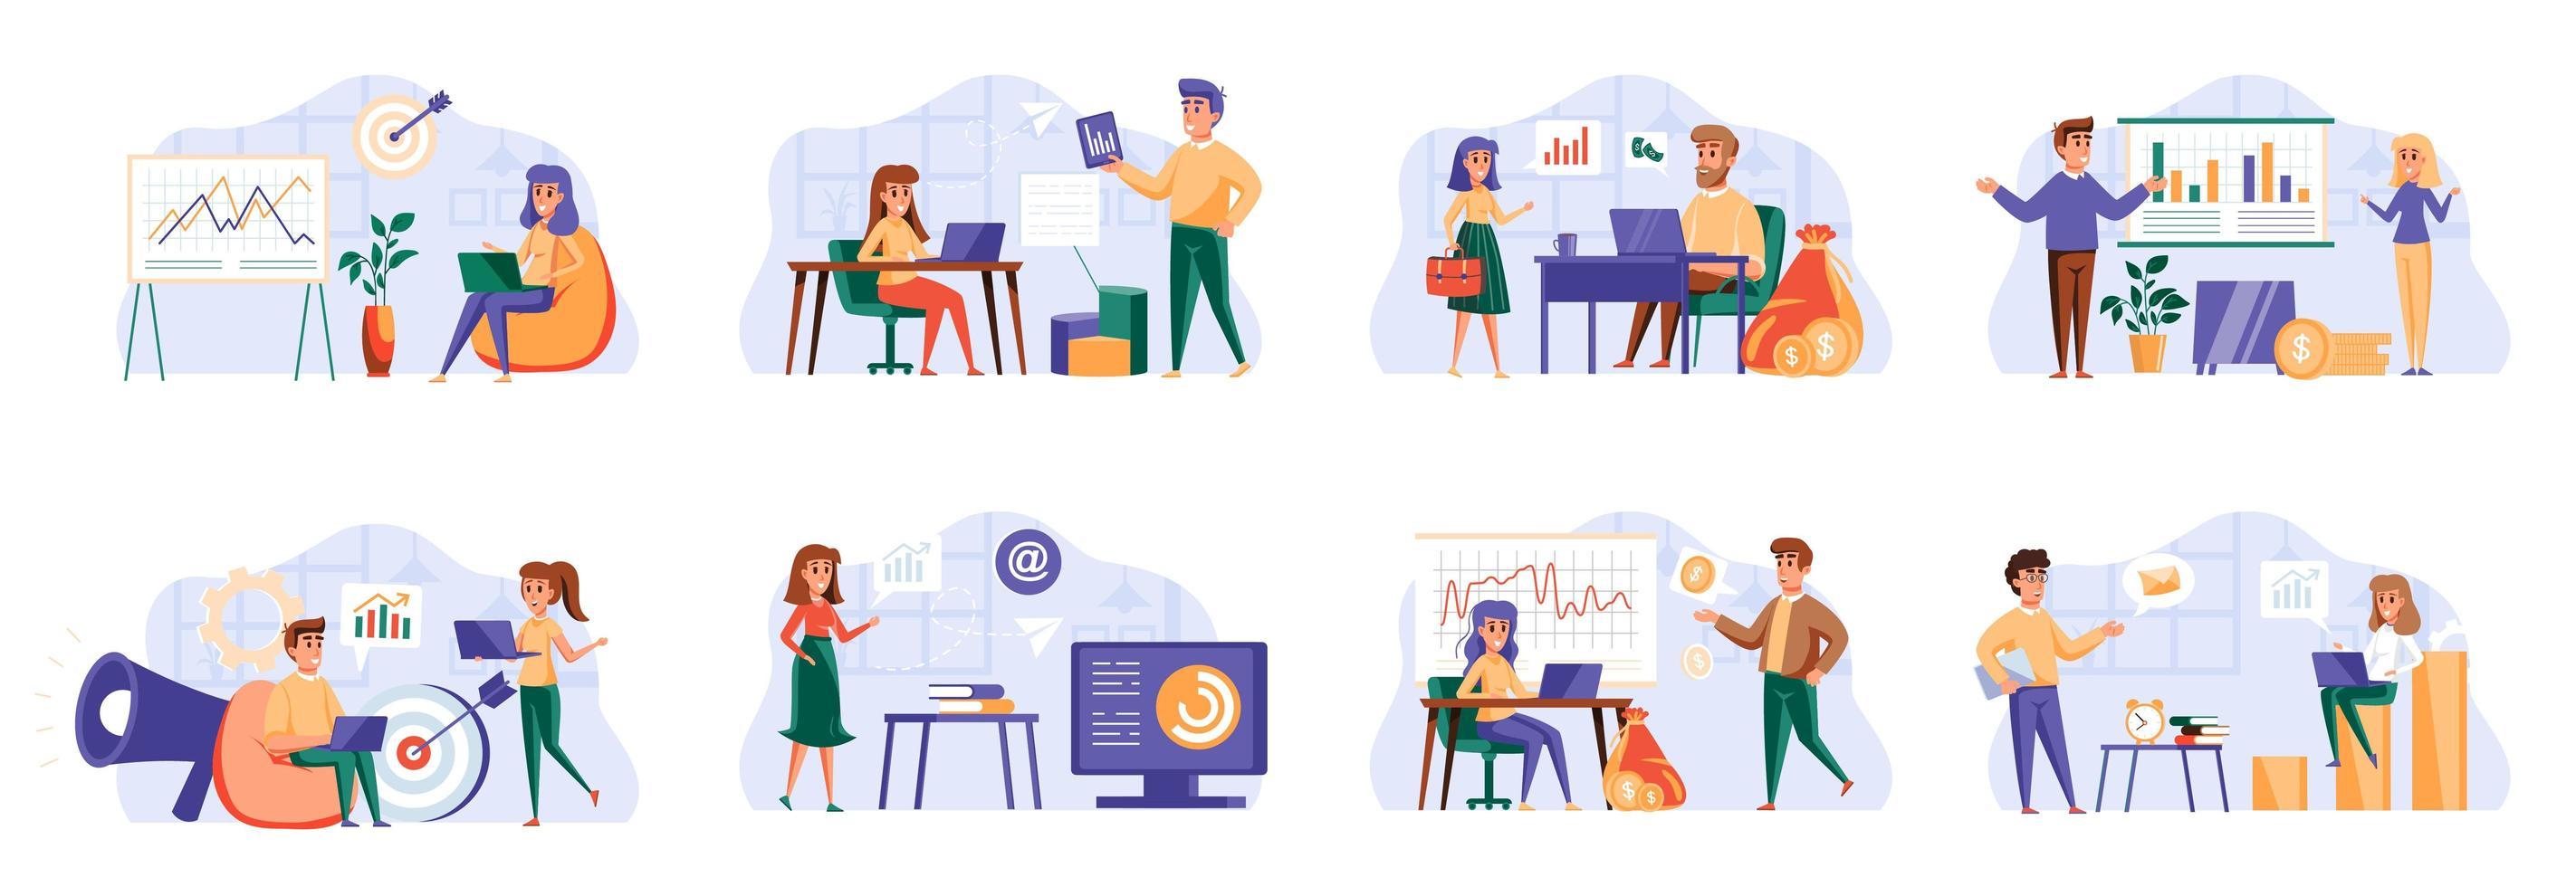 Marketing-Strategie-Bundle mit Personencharakteren. vektor